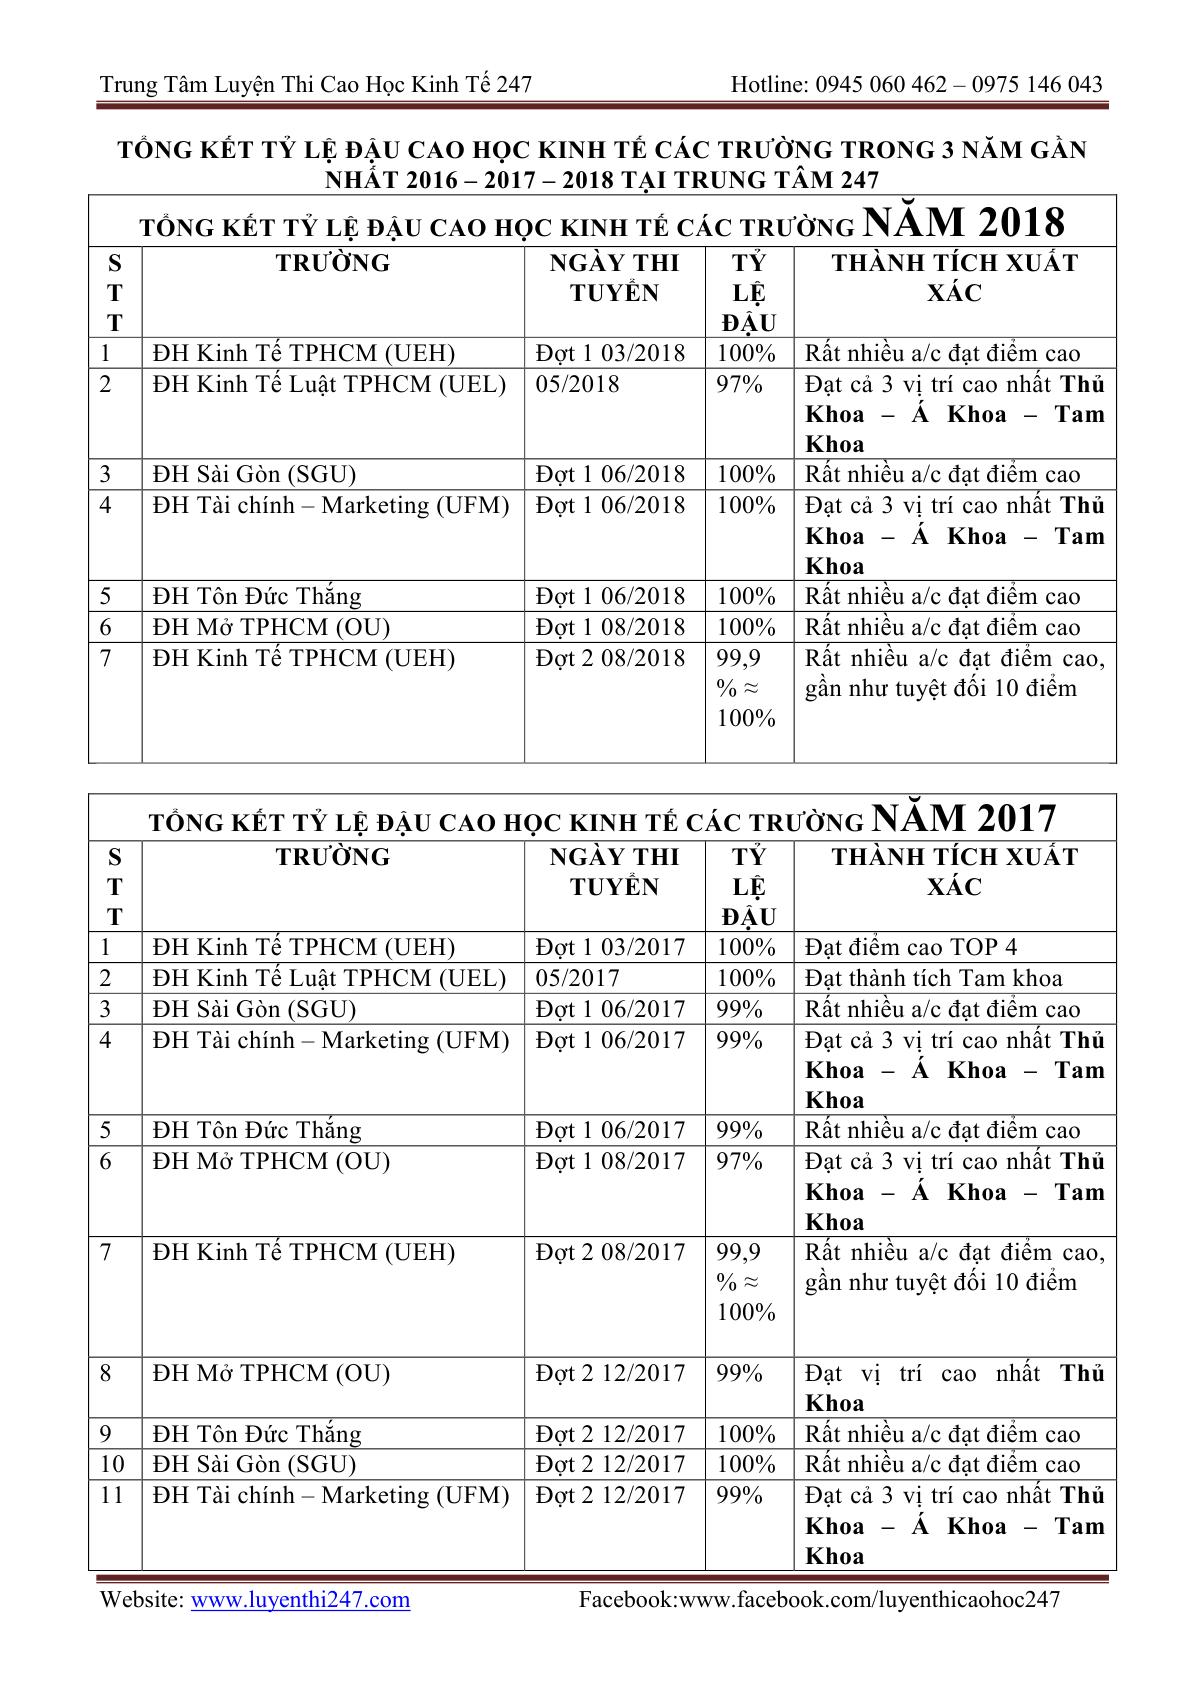 THONG TIN TUYEN SINH CAC TRUONG 201921